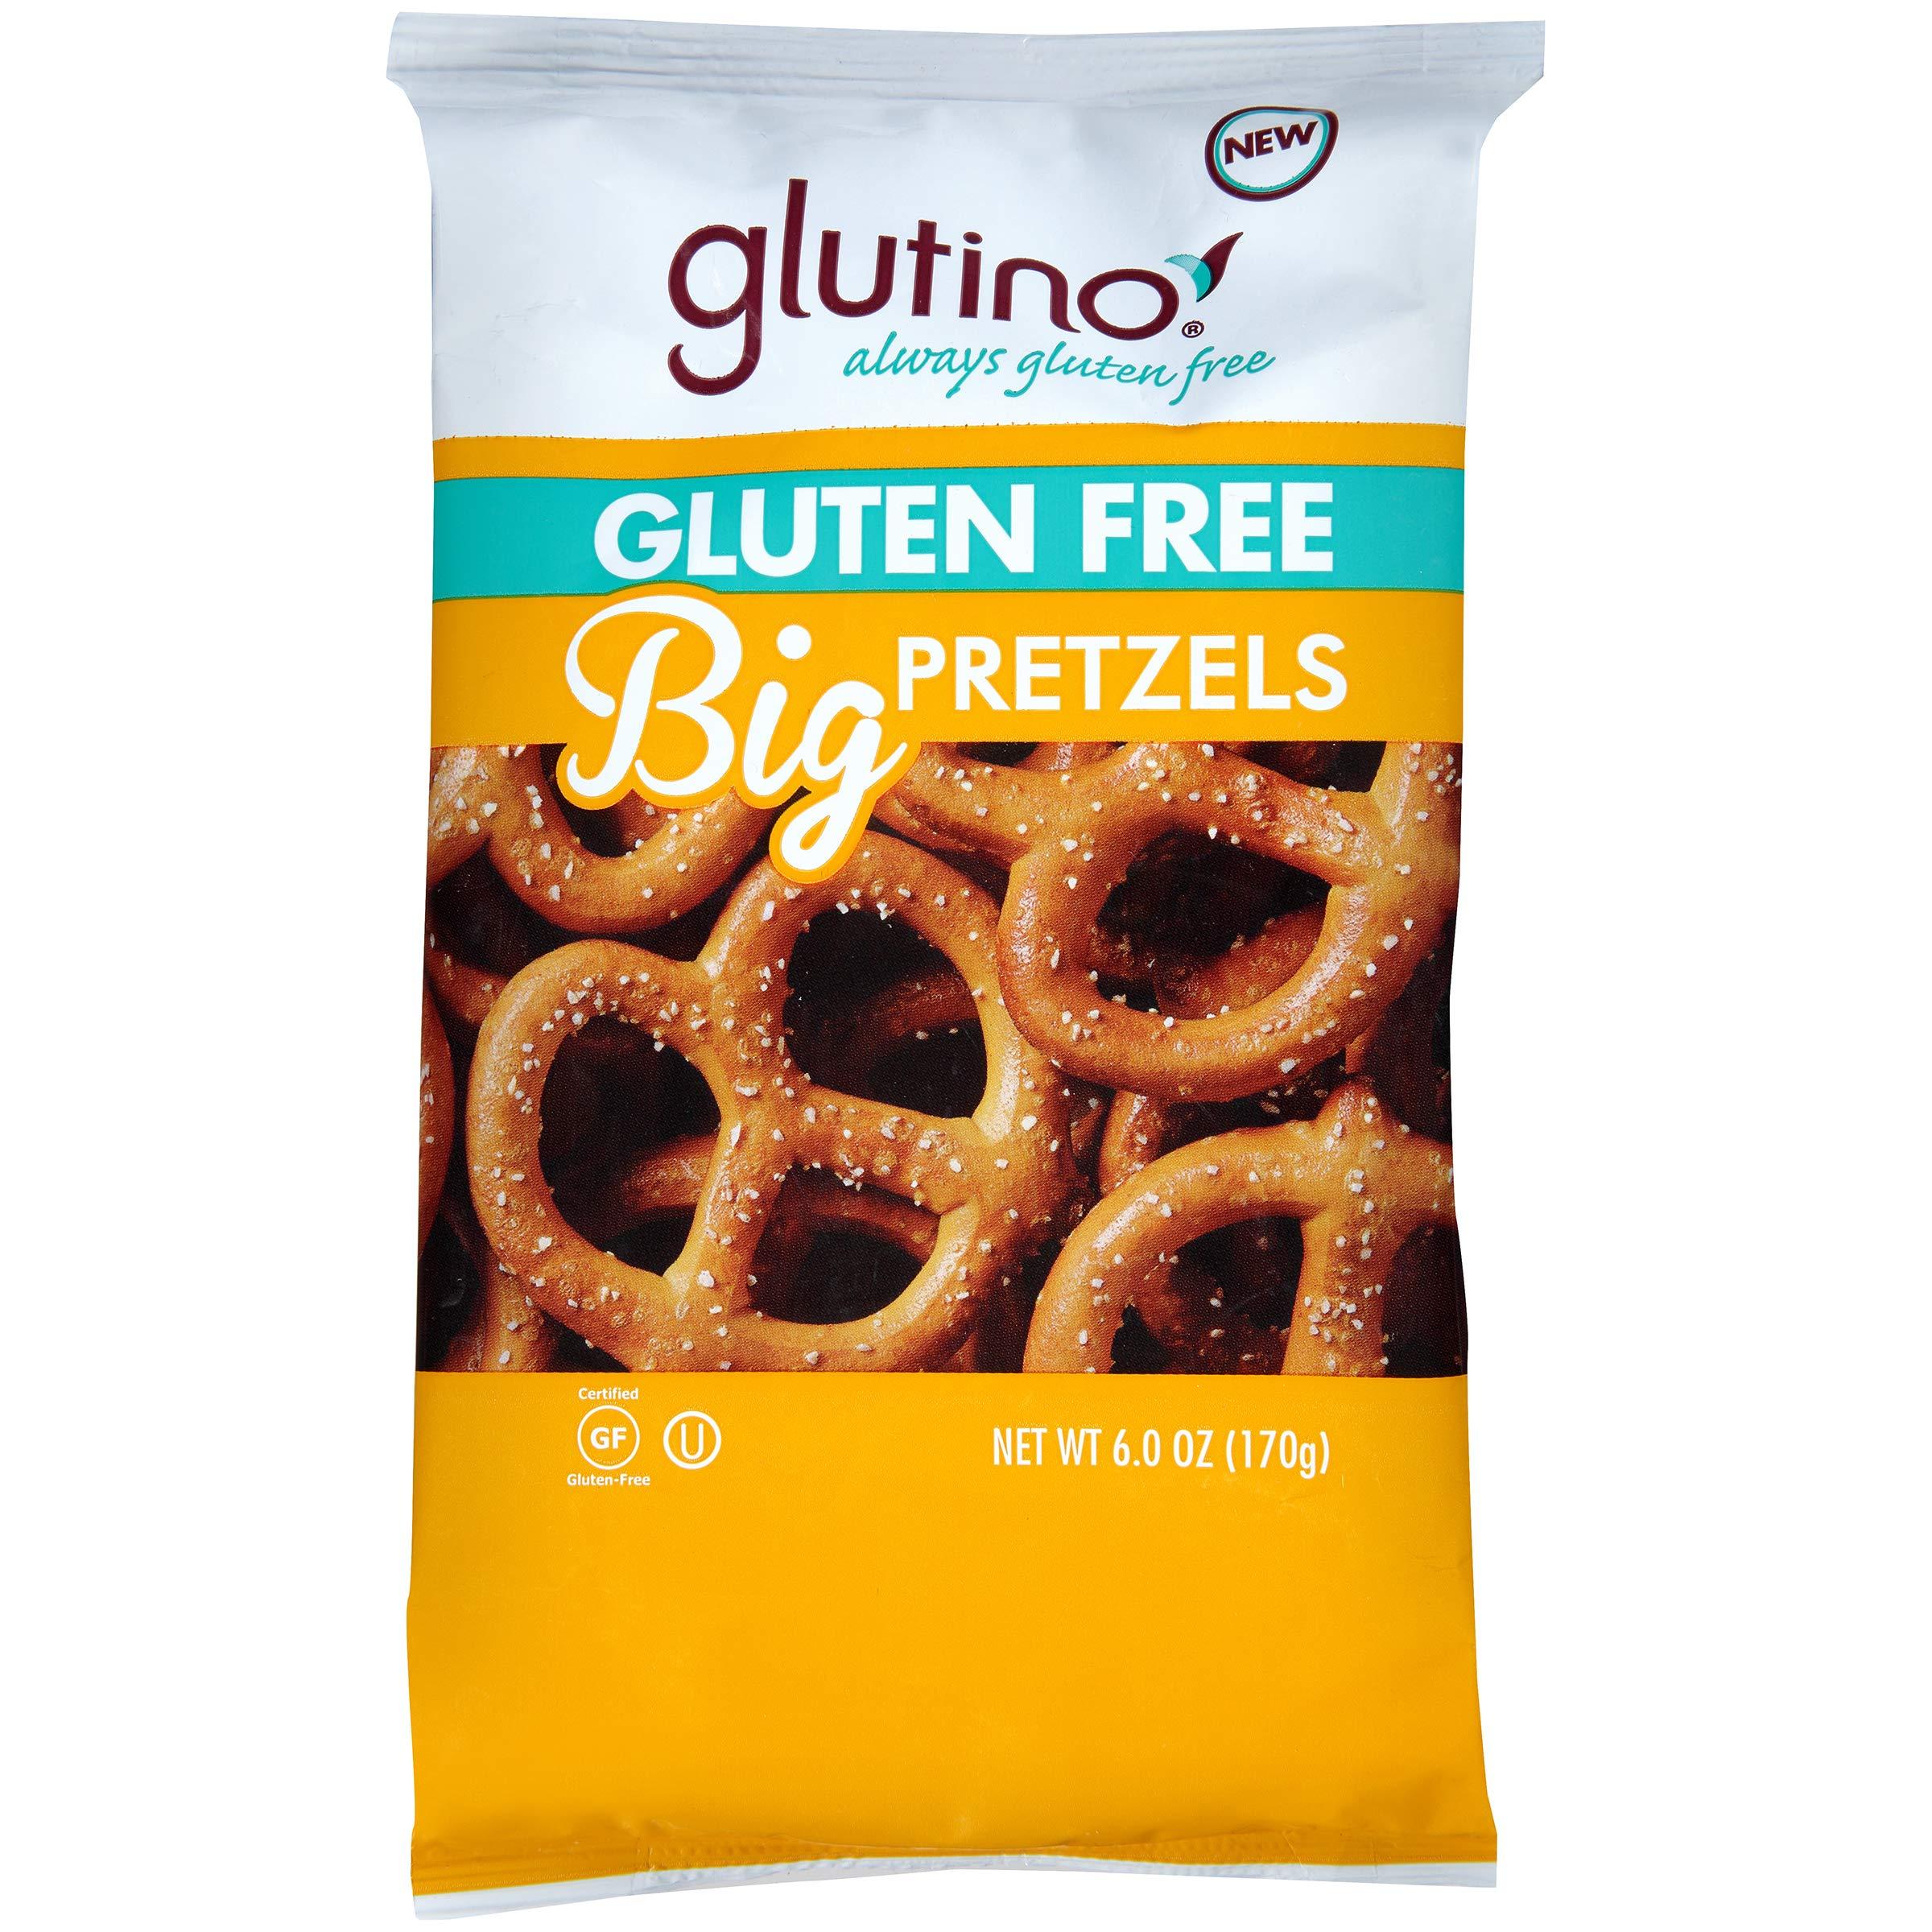 Glutino Gluten Free Pretzels, Big Pretzels, Delicious Everyday Snack, Lightly Salted, 6 Ounce